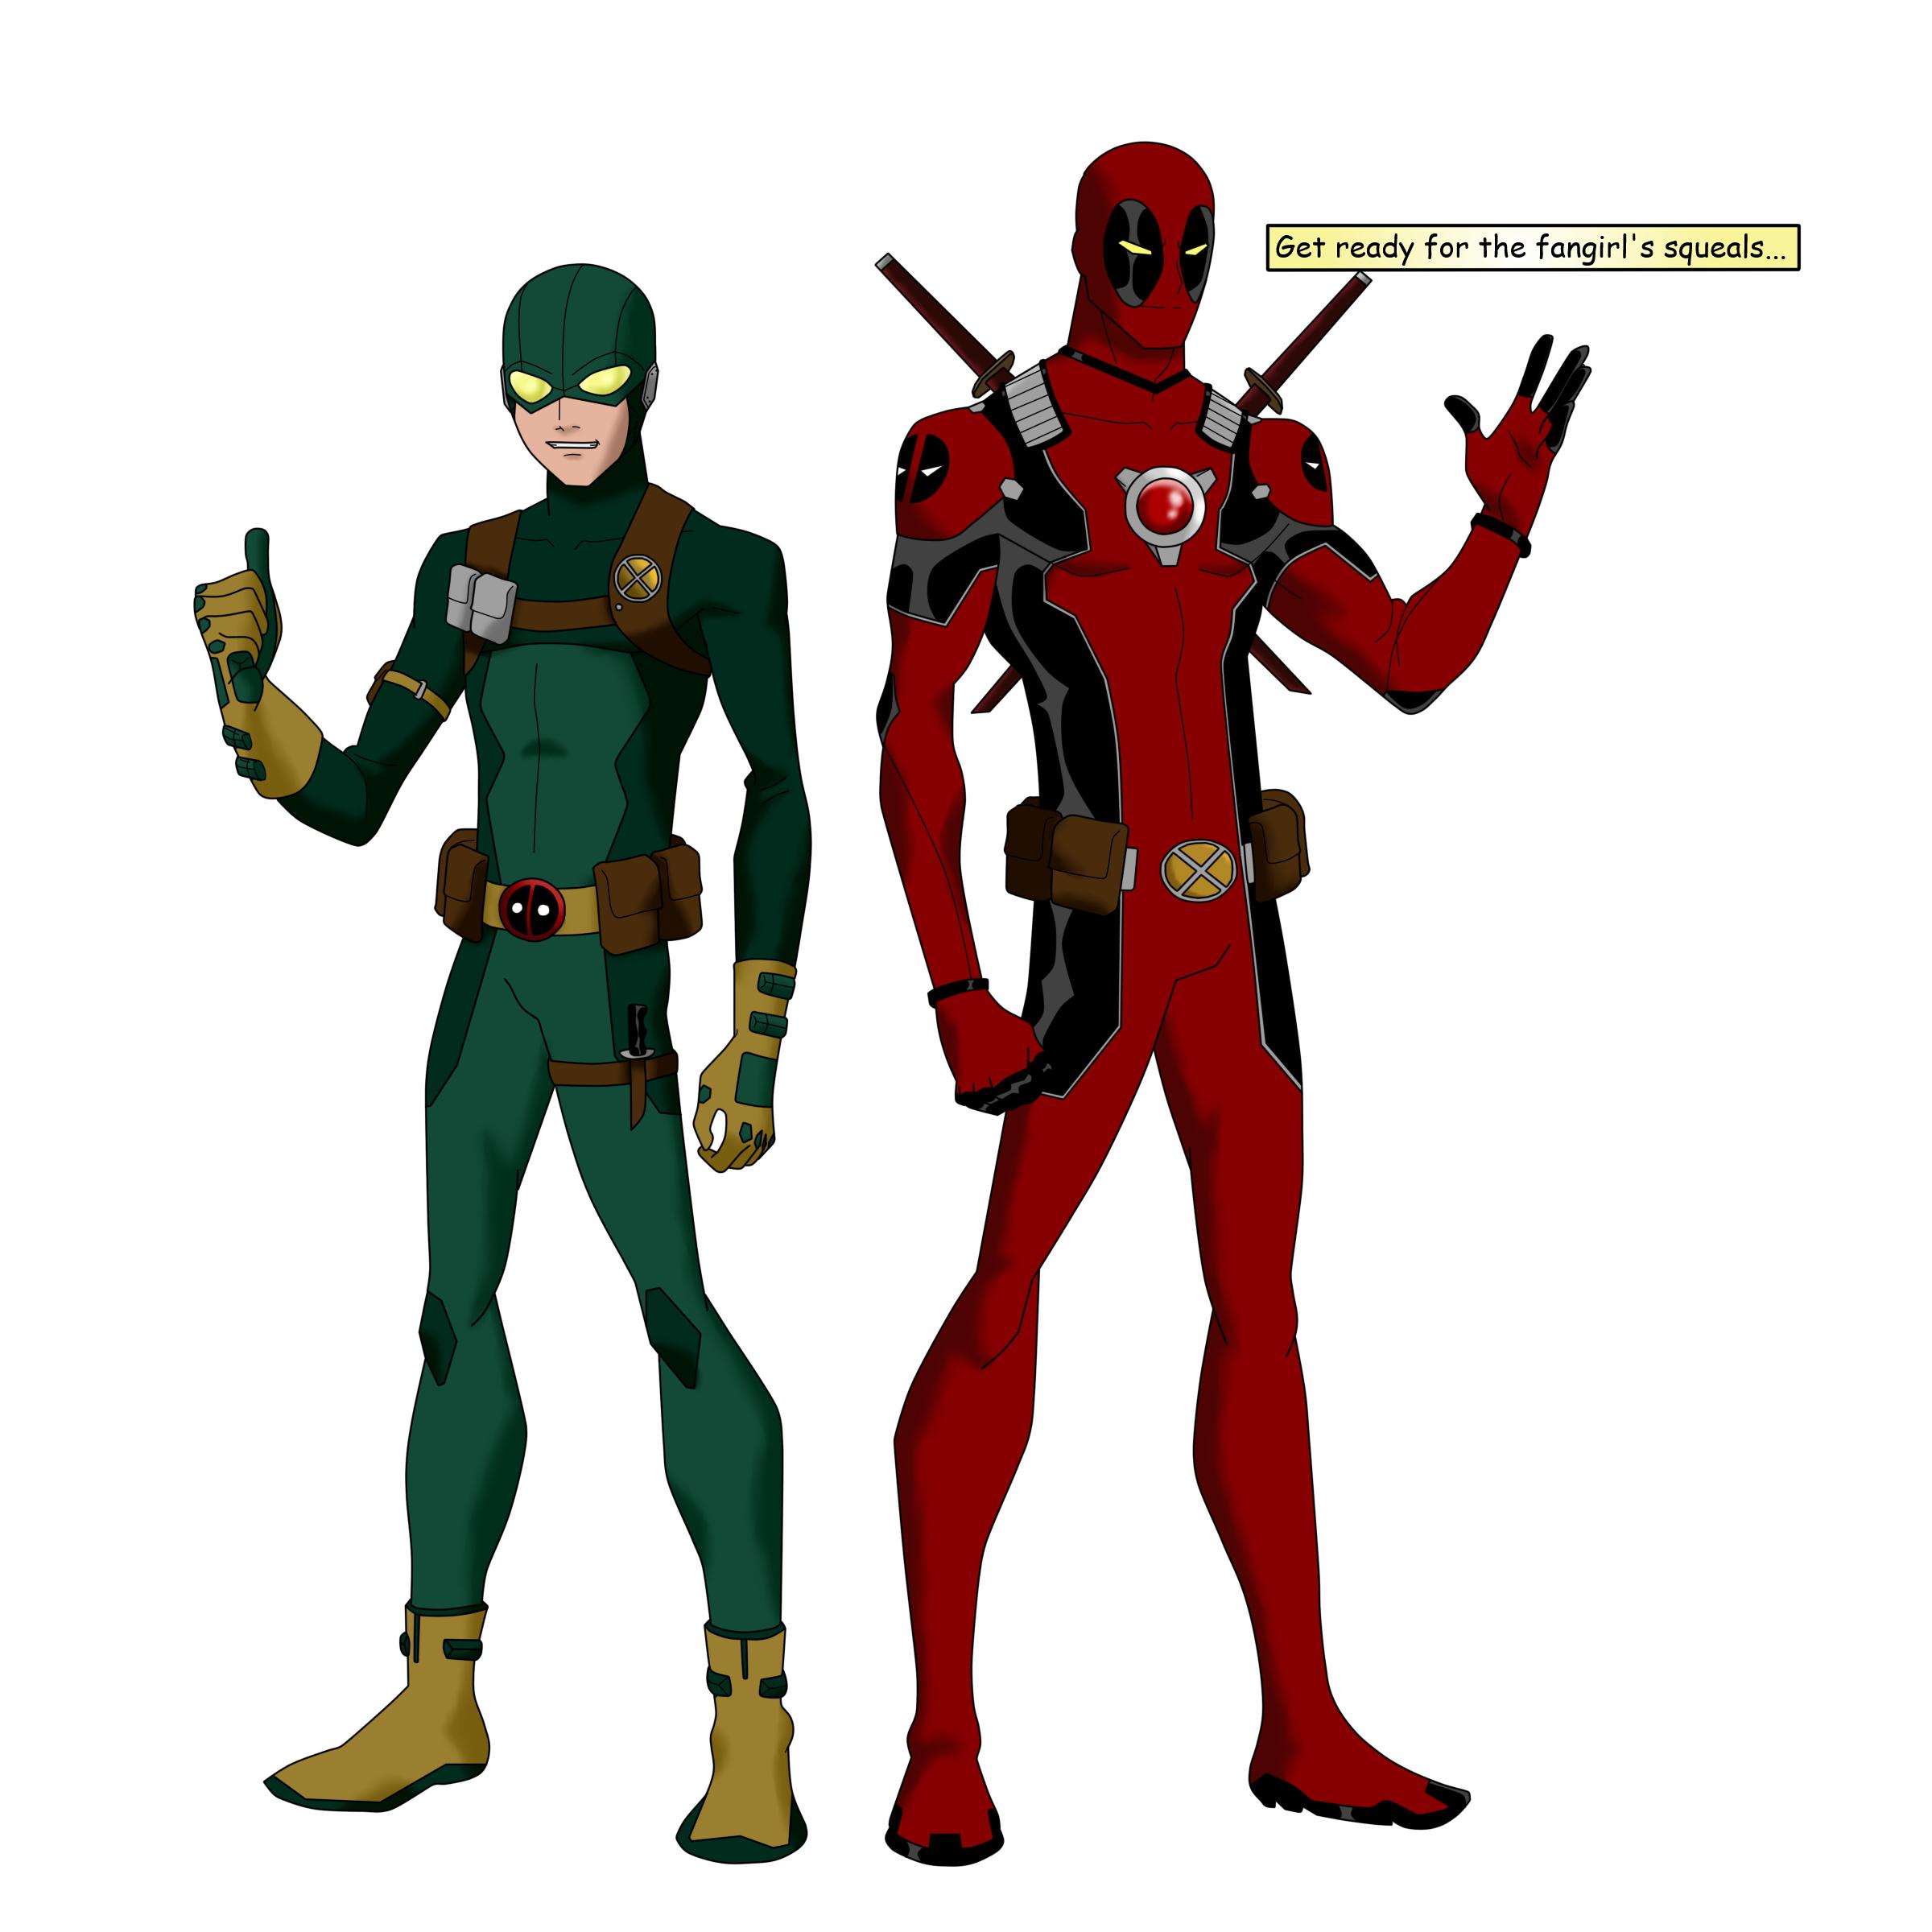 Deadpool And Bob, Agent Of... X? By BobbenKatzen On DeviantArt